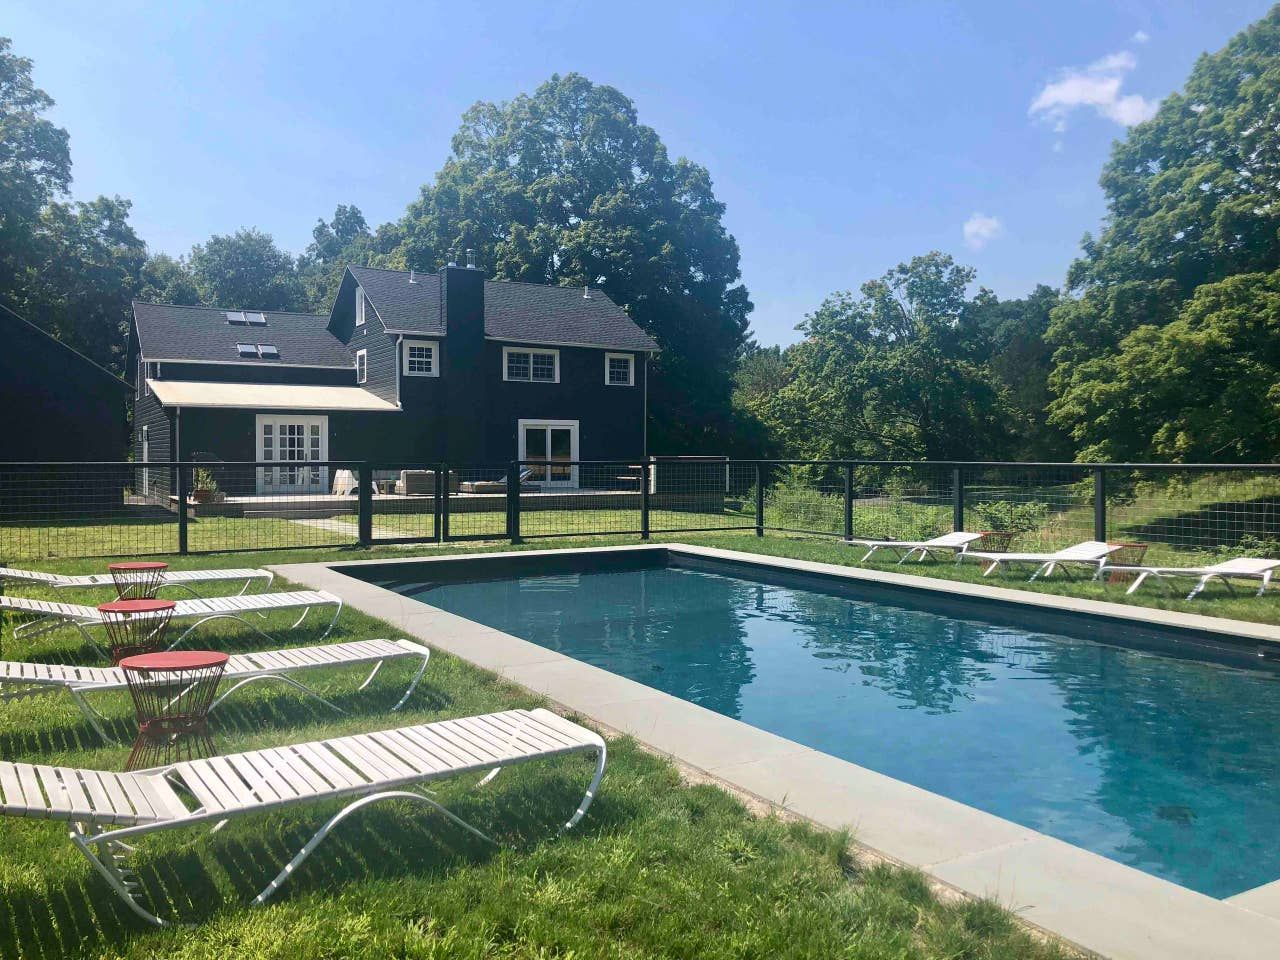 Stunning 1800's renovated farmhouse w/hot tub+pool